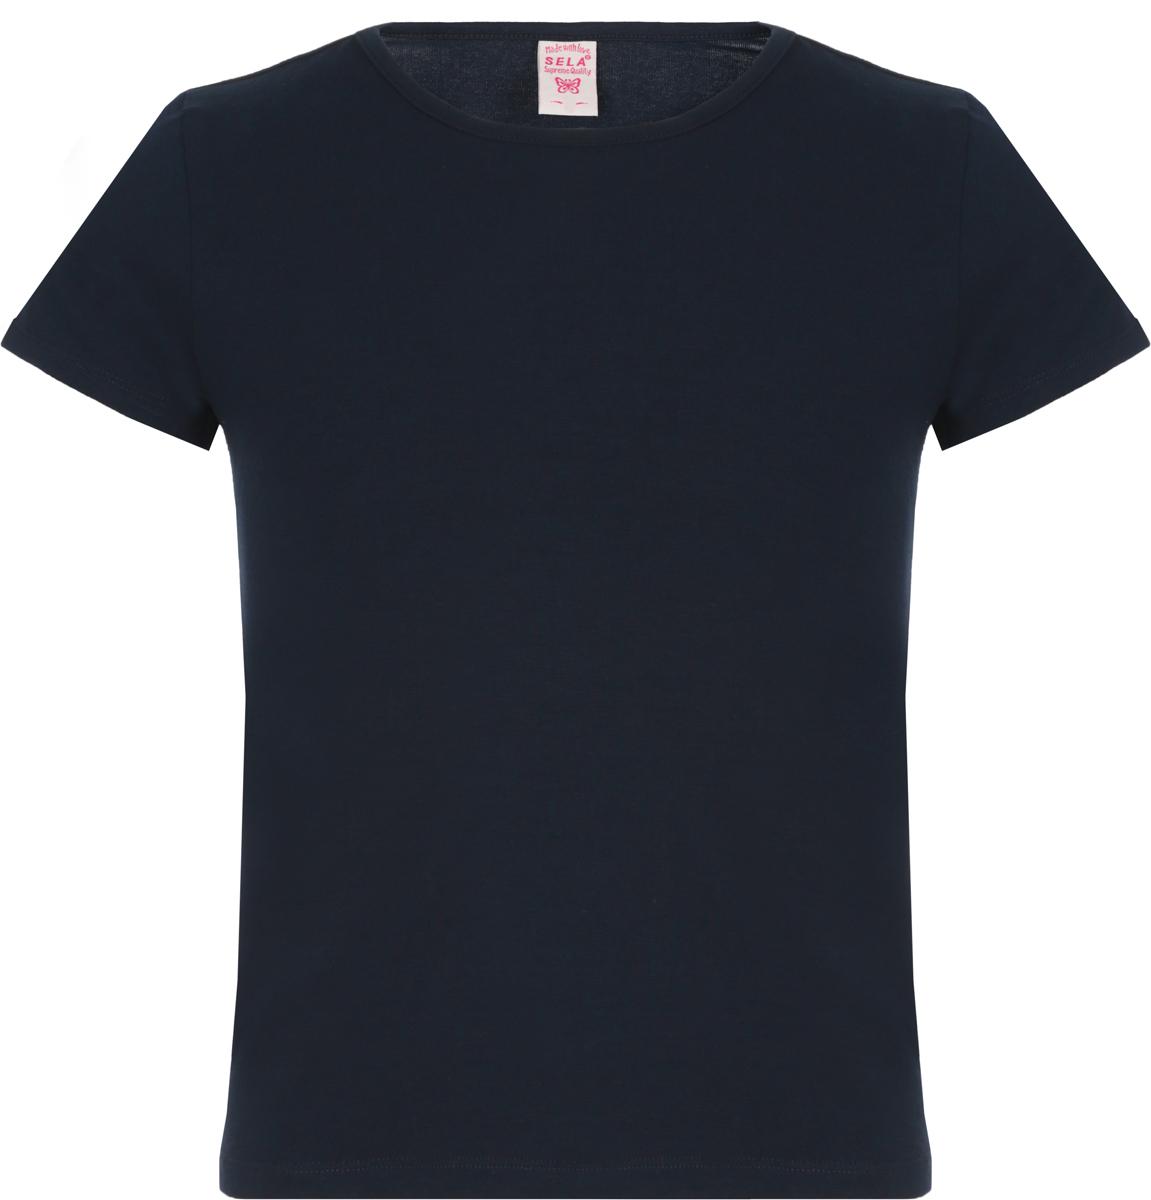 Футболка для девочки Sela, цвет: темно-синий. Ts-611/1276-8330. Размер 158 спортивный костюм для девочки adidas yg hood pes ts цвет розовый темно синий bs2151 размер 116